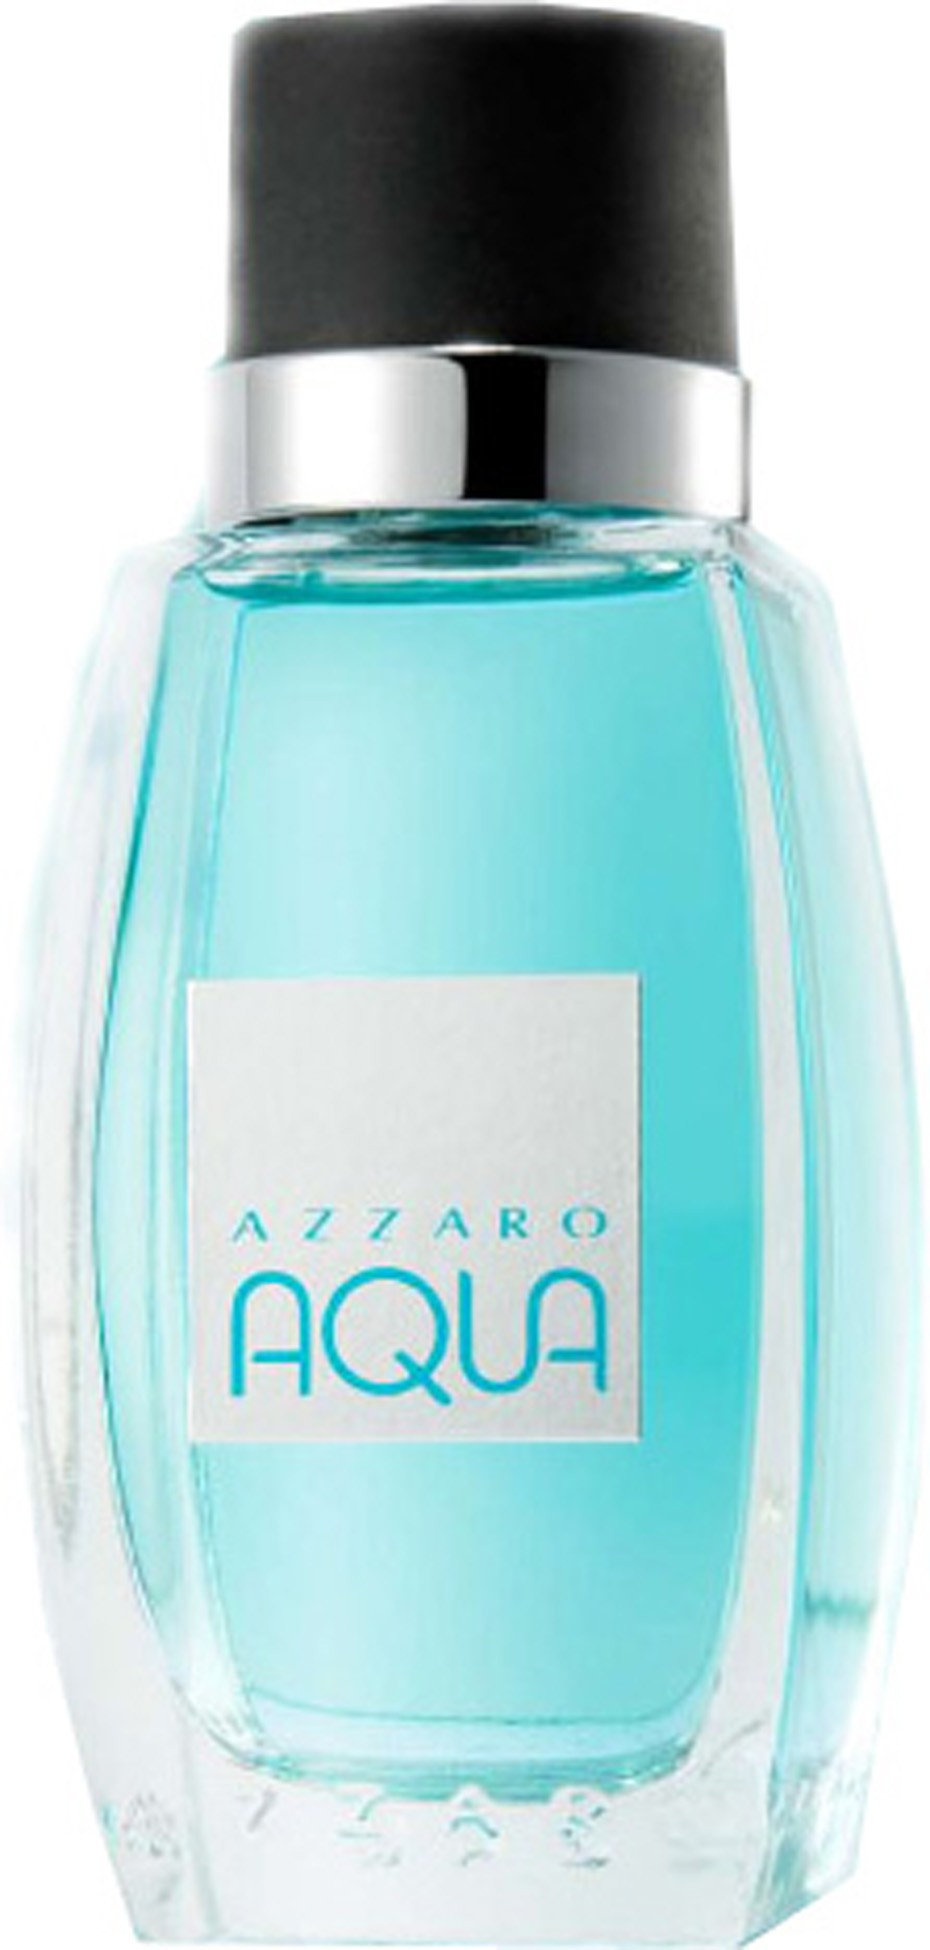 Azzaro Aqua аромат для мужчин